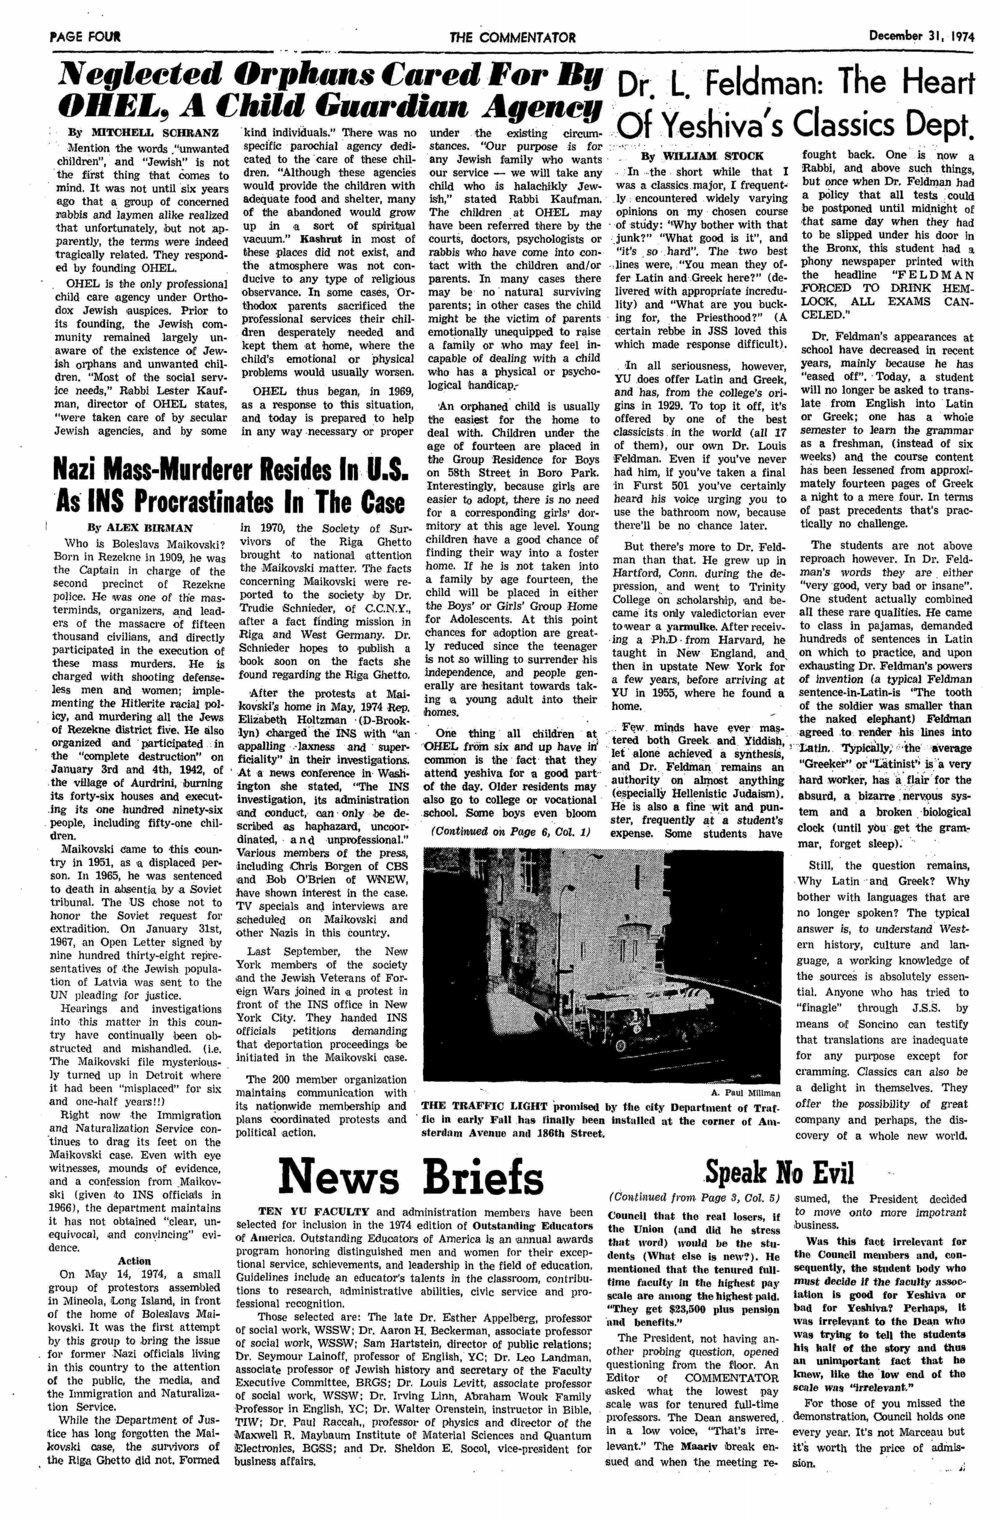 1974.12.31.TC---Dr. L. Feldman.jpg